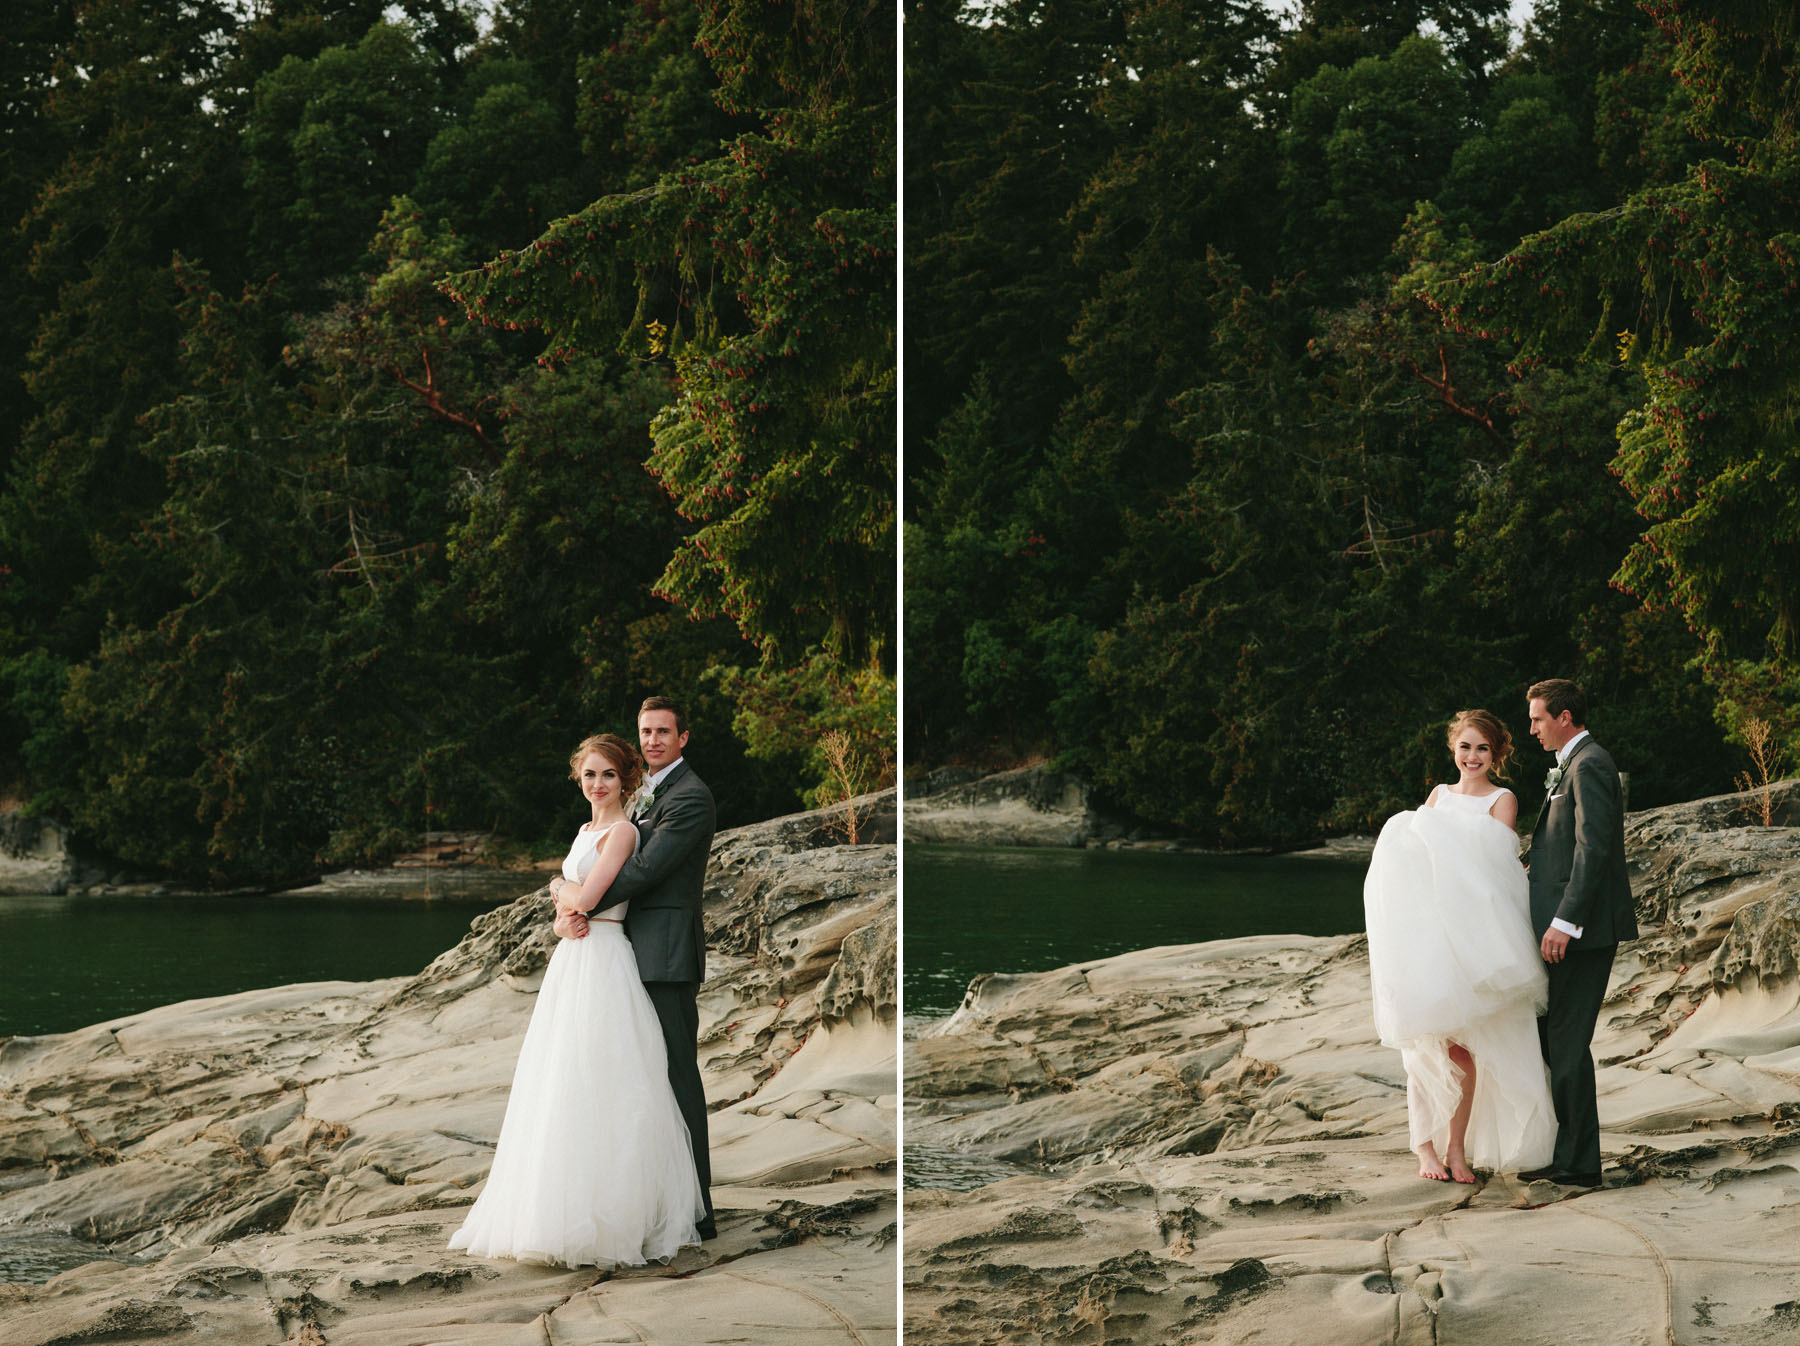 thetis-island-wedding-photographer-rp-rn-143.jpg